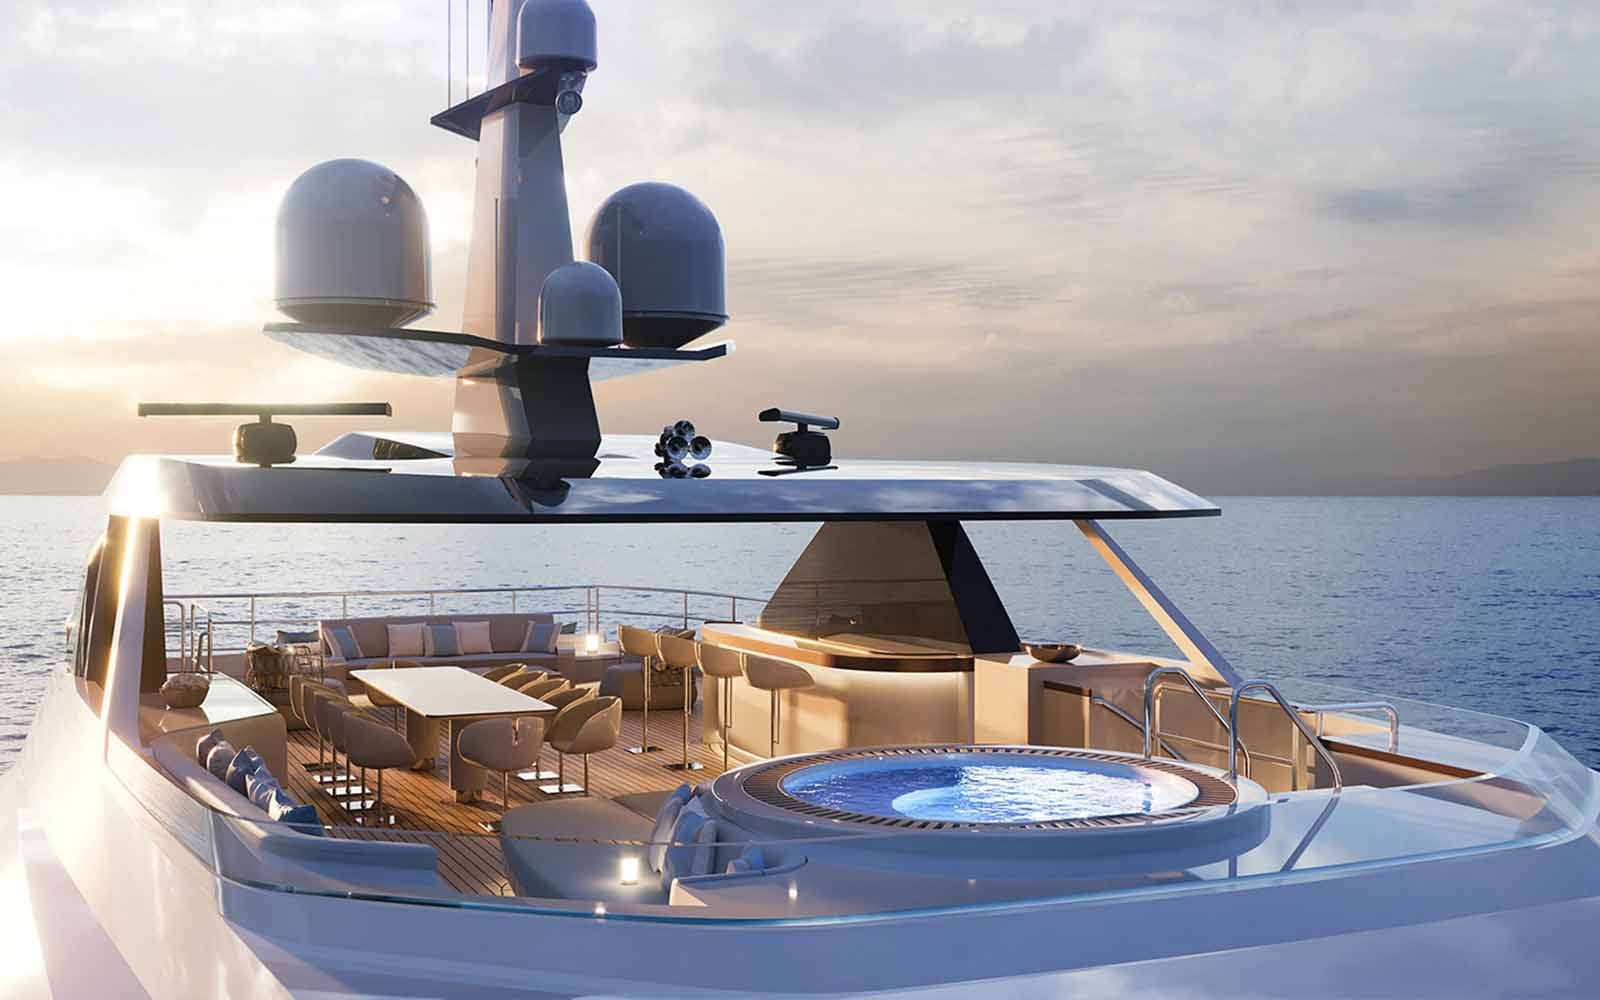 heesen 5700 Aluminium Class Project Akira - boat shopping